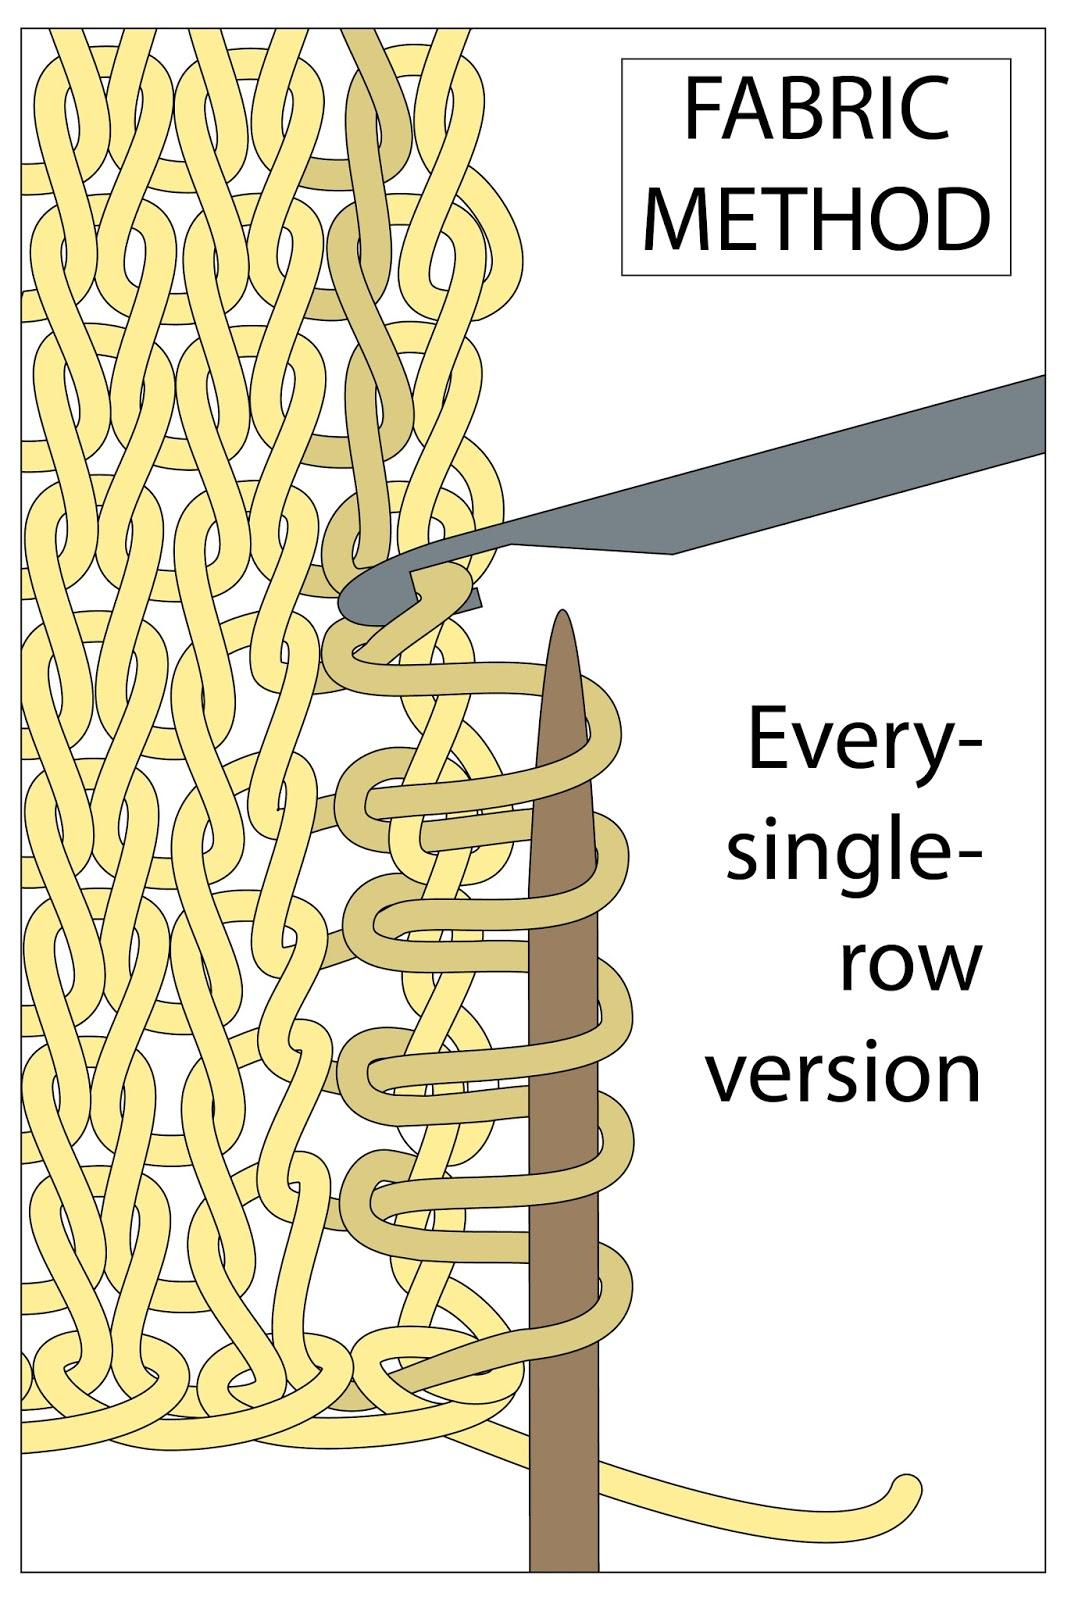 Knitting Pick Up Stitches On An Edge : Picking up stitches along a selvedge TECHknitting  Bloglovin